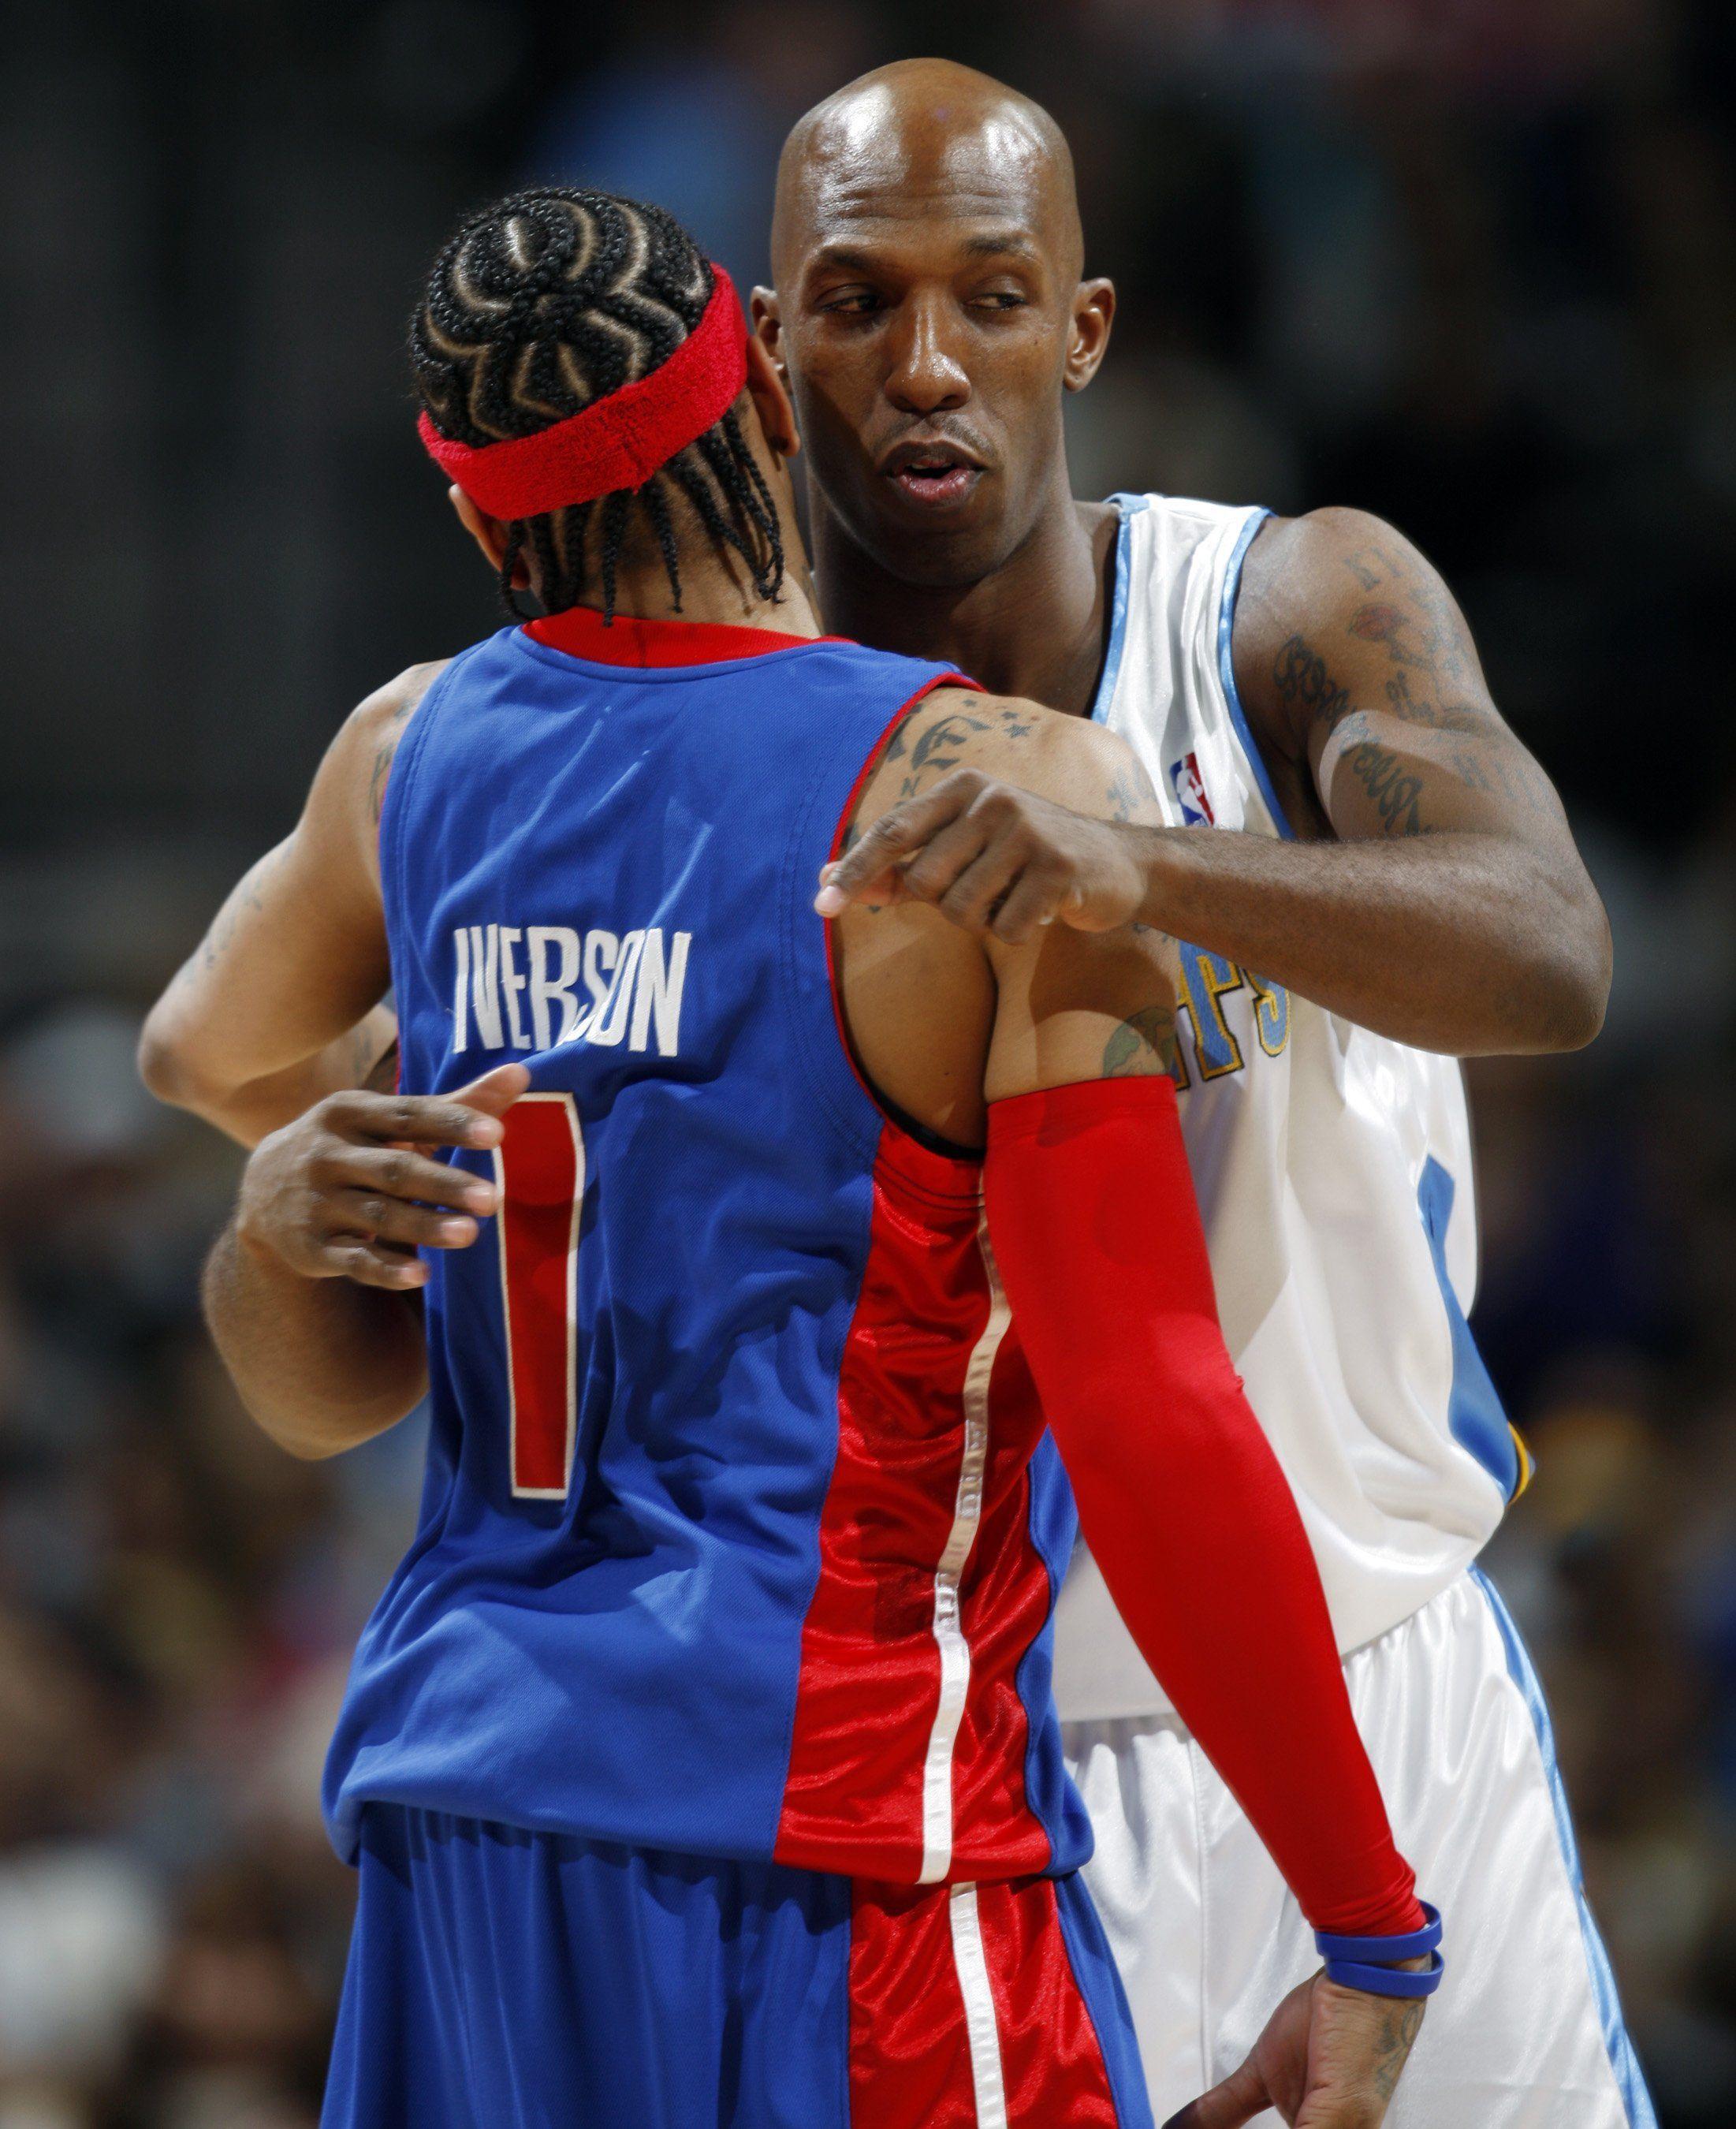 Detroit Pistons guard Allen Iverson, left, hugs Denver Nuggets guard Chauncey Billups before a game in Denver on Jan. 9, 2009.